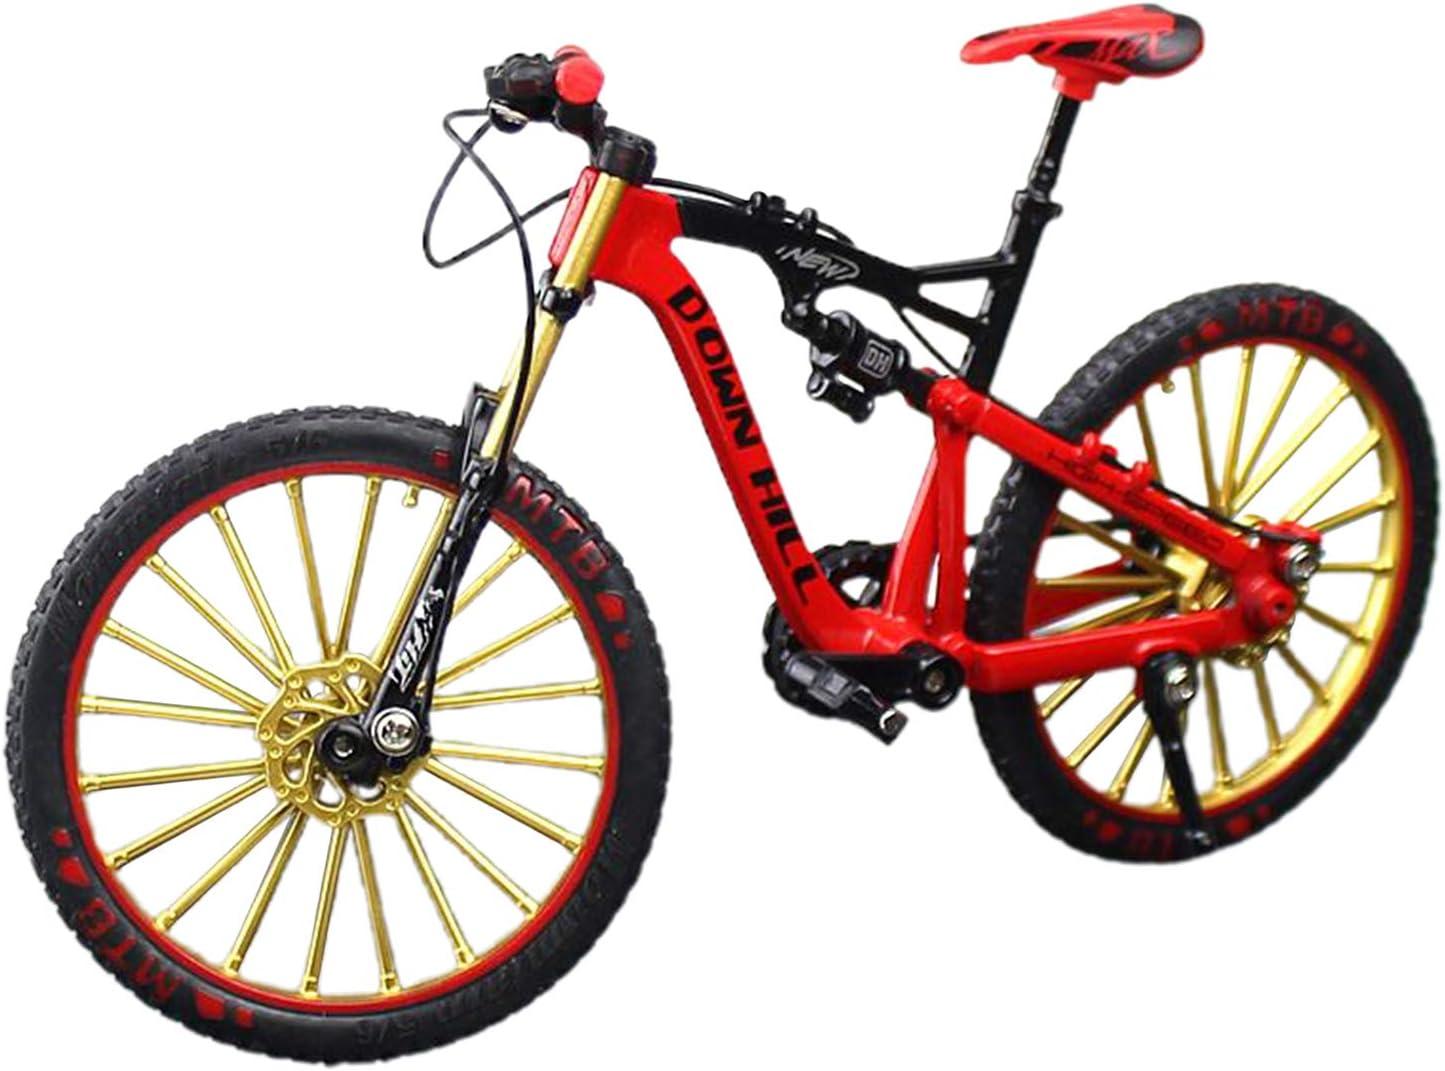 #N Mesa Mall A Max 76% OFF Bike Model Die-Cast Toy 1:10 Scale Simulate Ridi